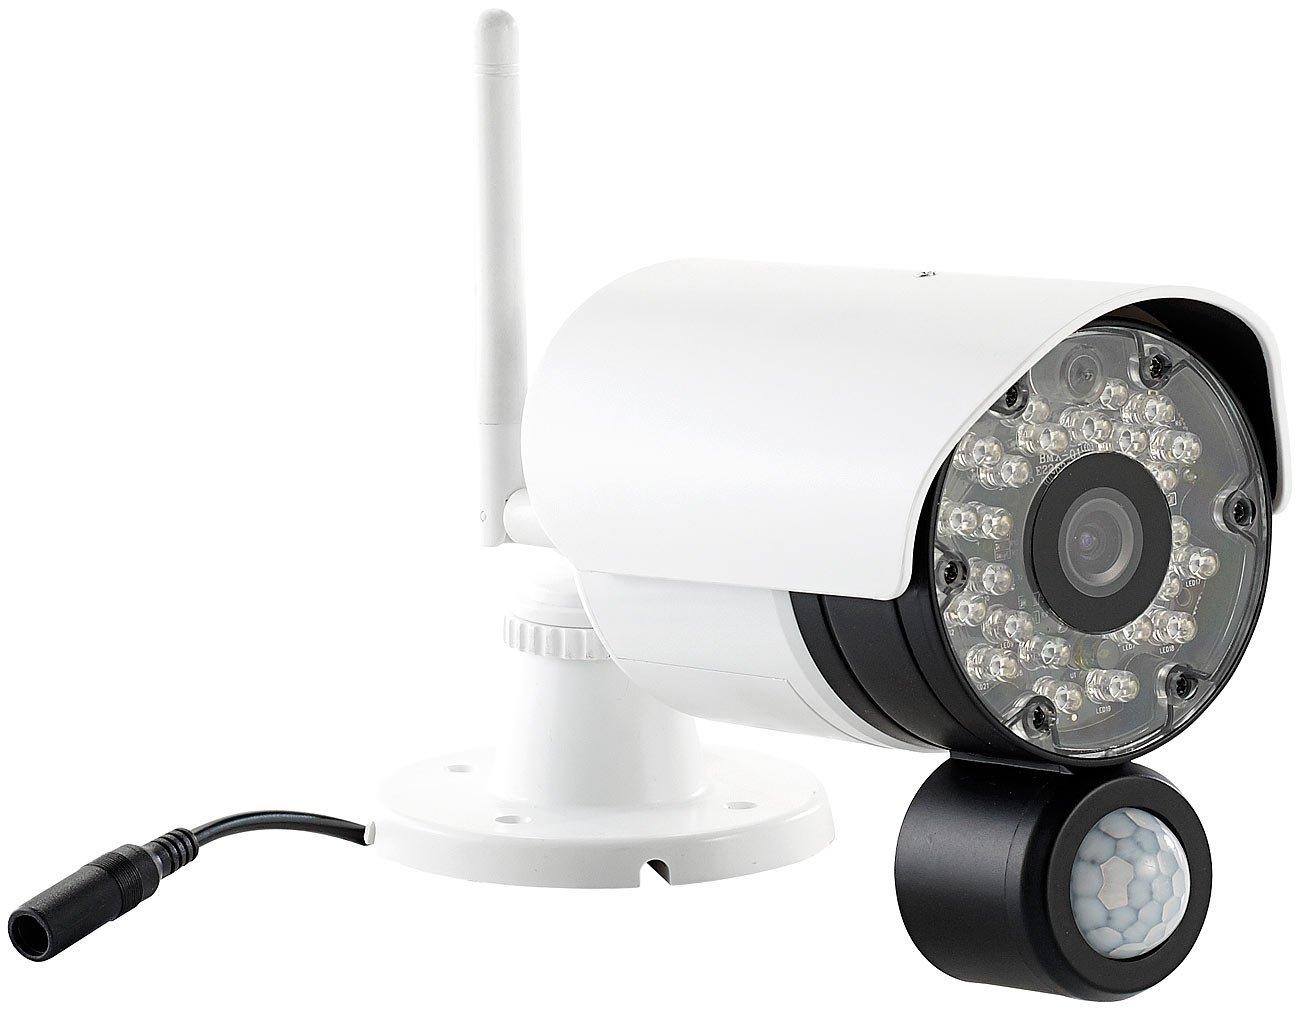 VisorTech PX-3747-944 DSC-720 - Cámara de vigilancia (con sensor pasivo de infrarrojos PIR) (importado)